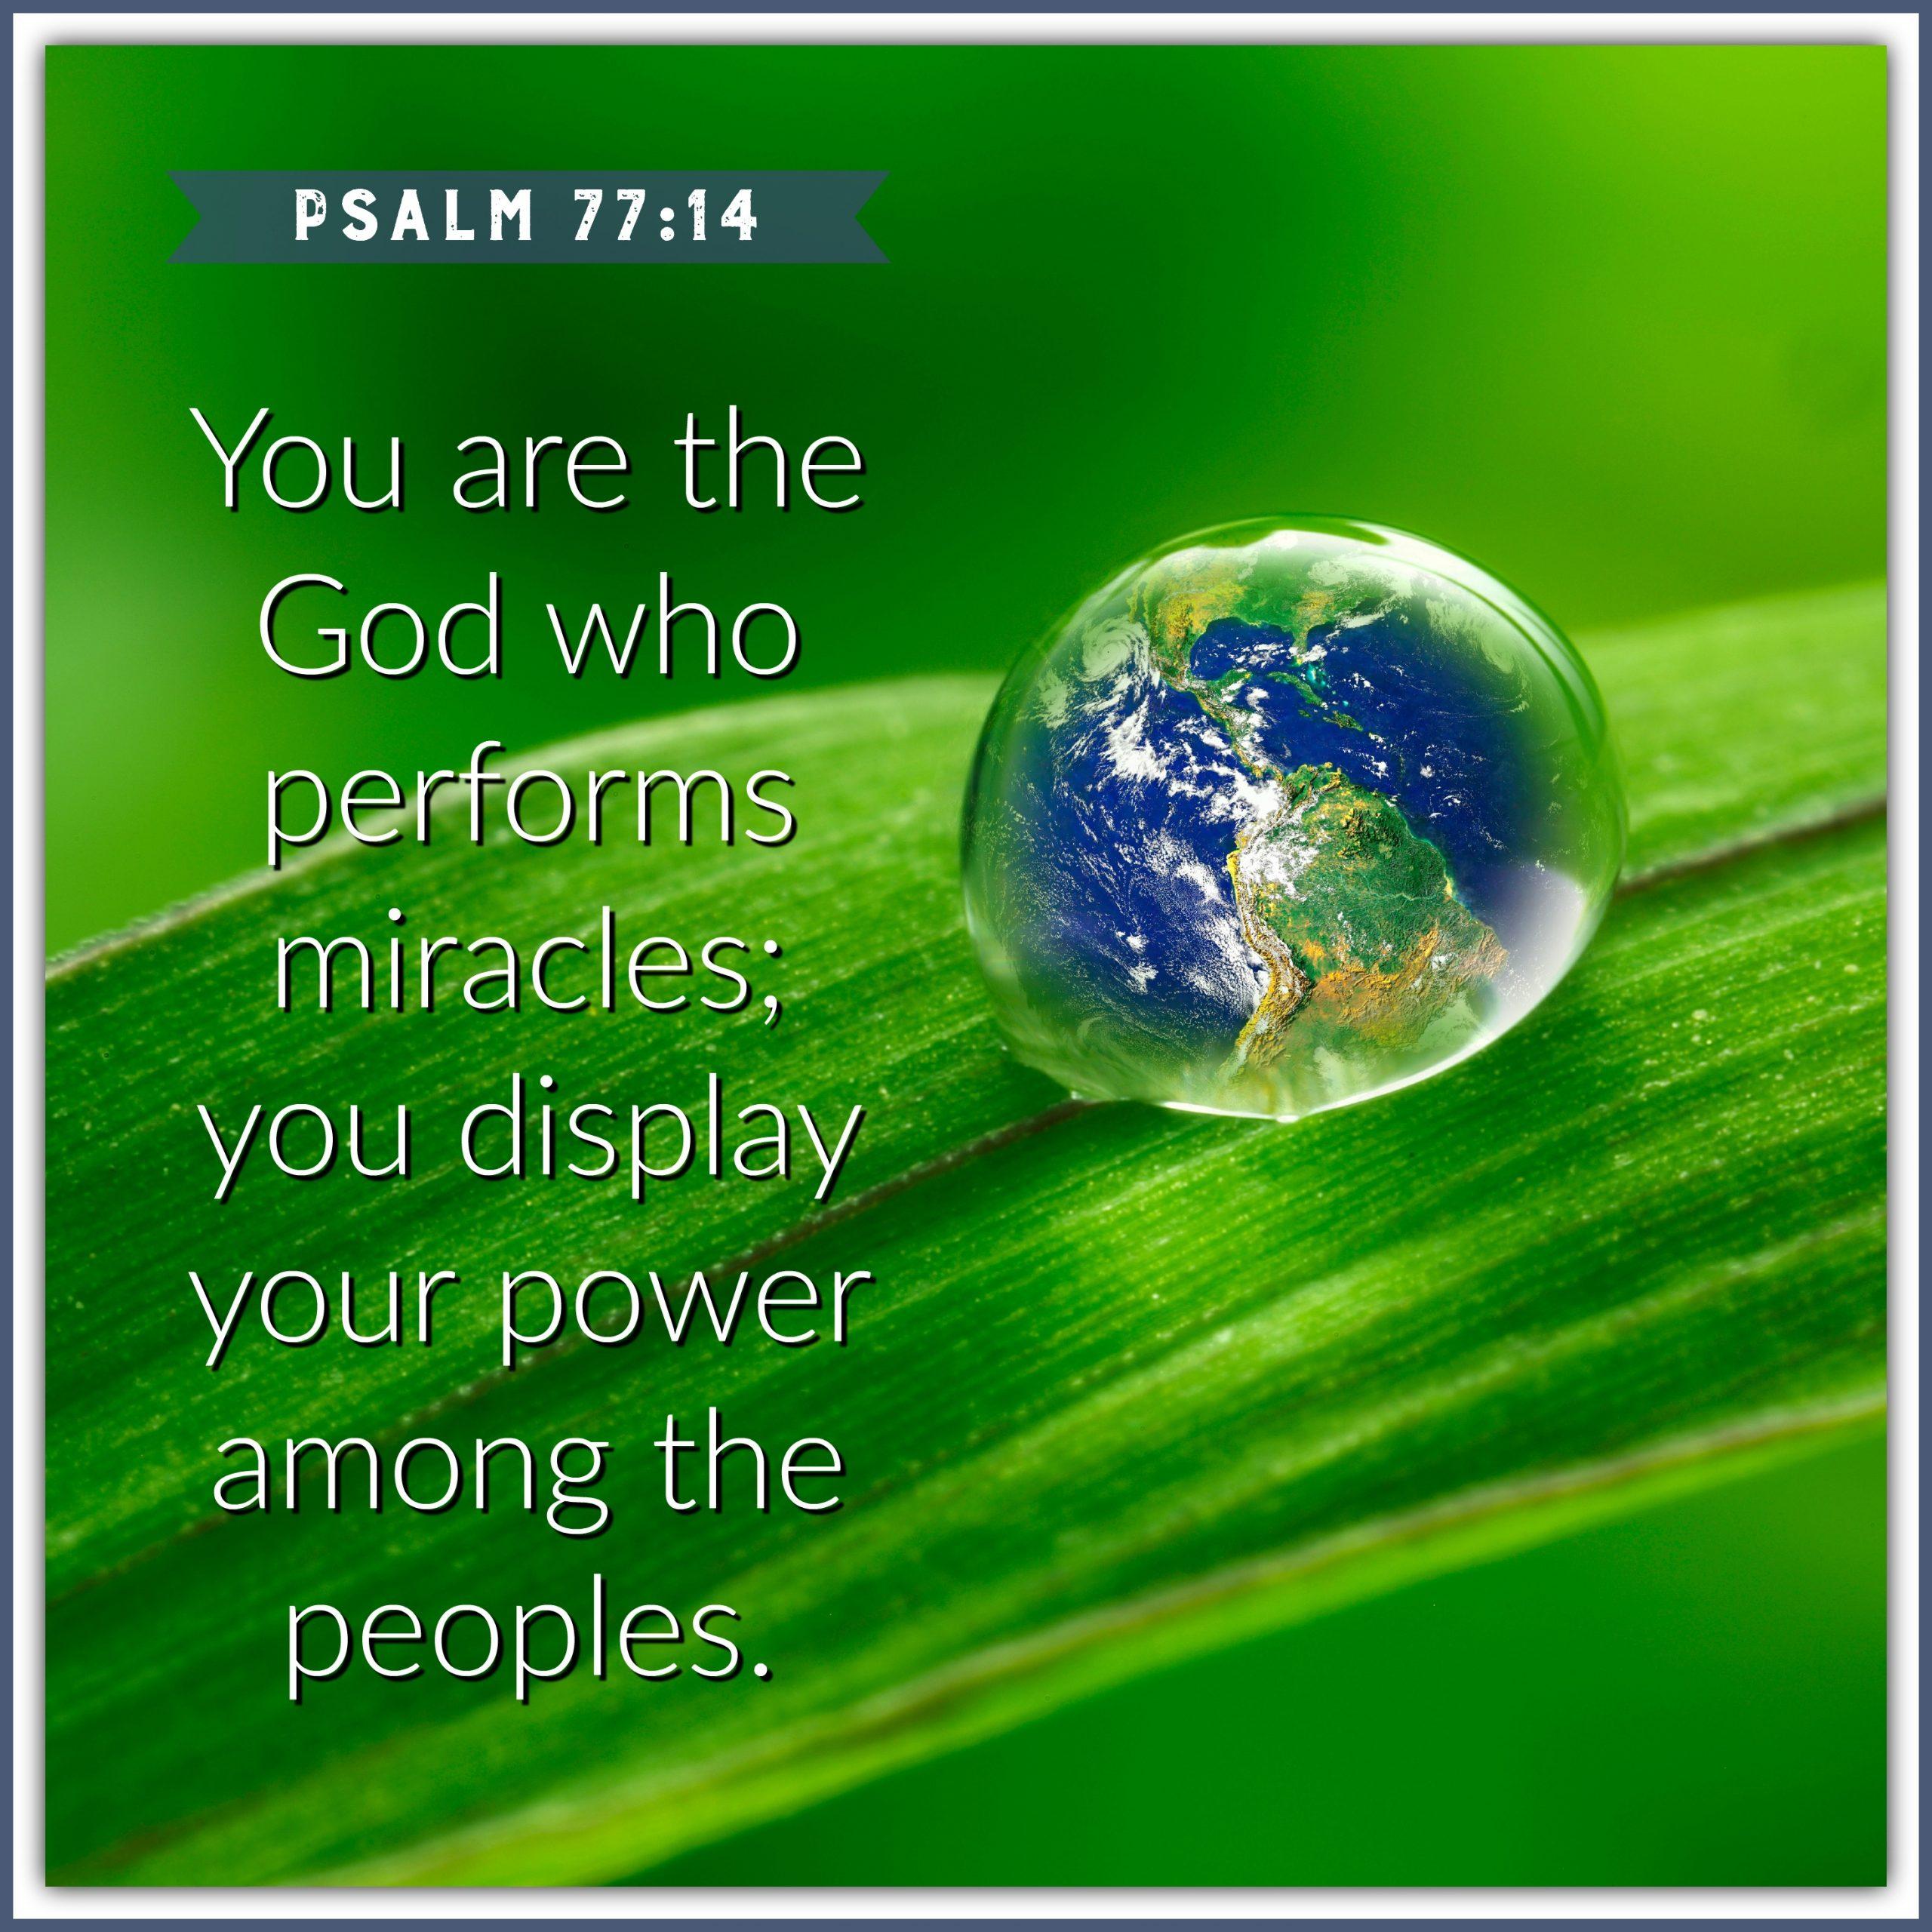 Psalm 77:14